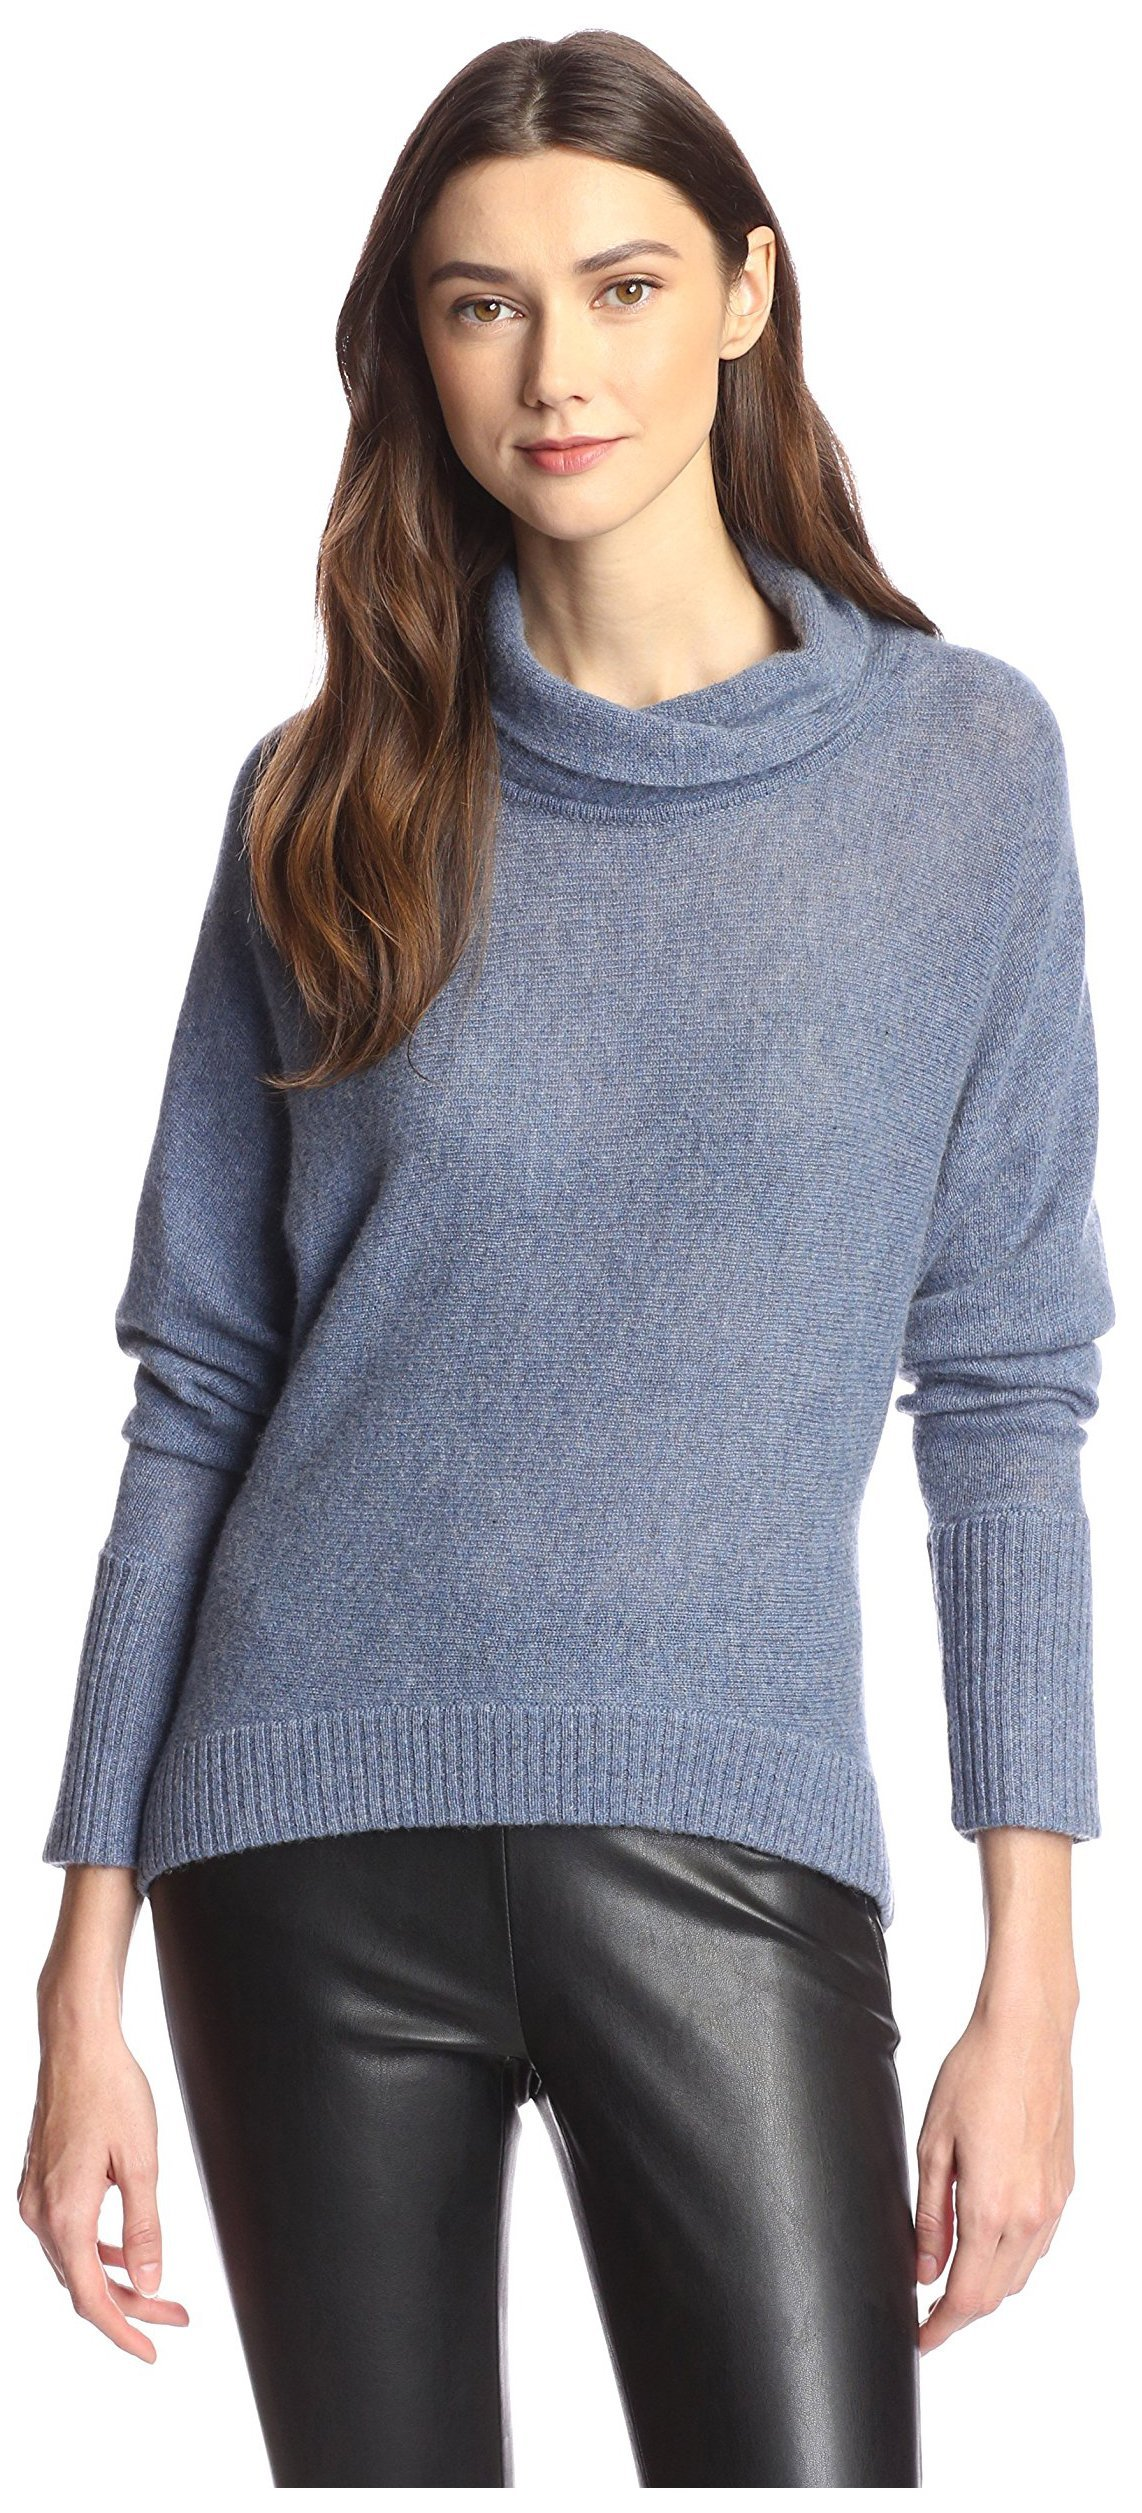 James & Erin Women's Cowl T-Neck Cashmere Sweater, Soft Denim, XL